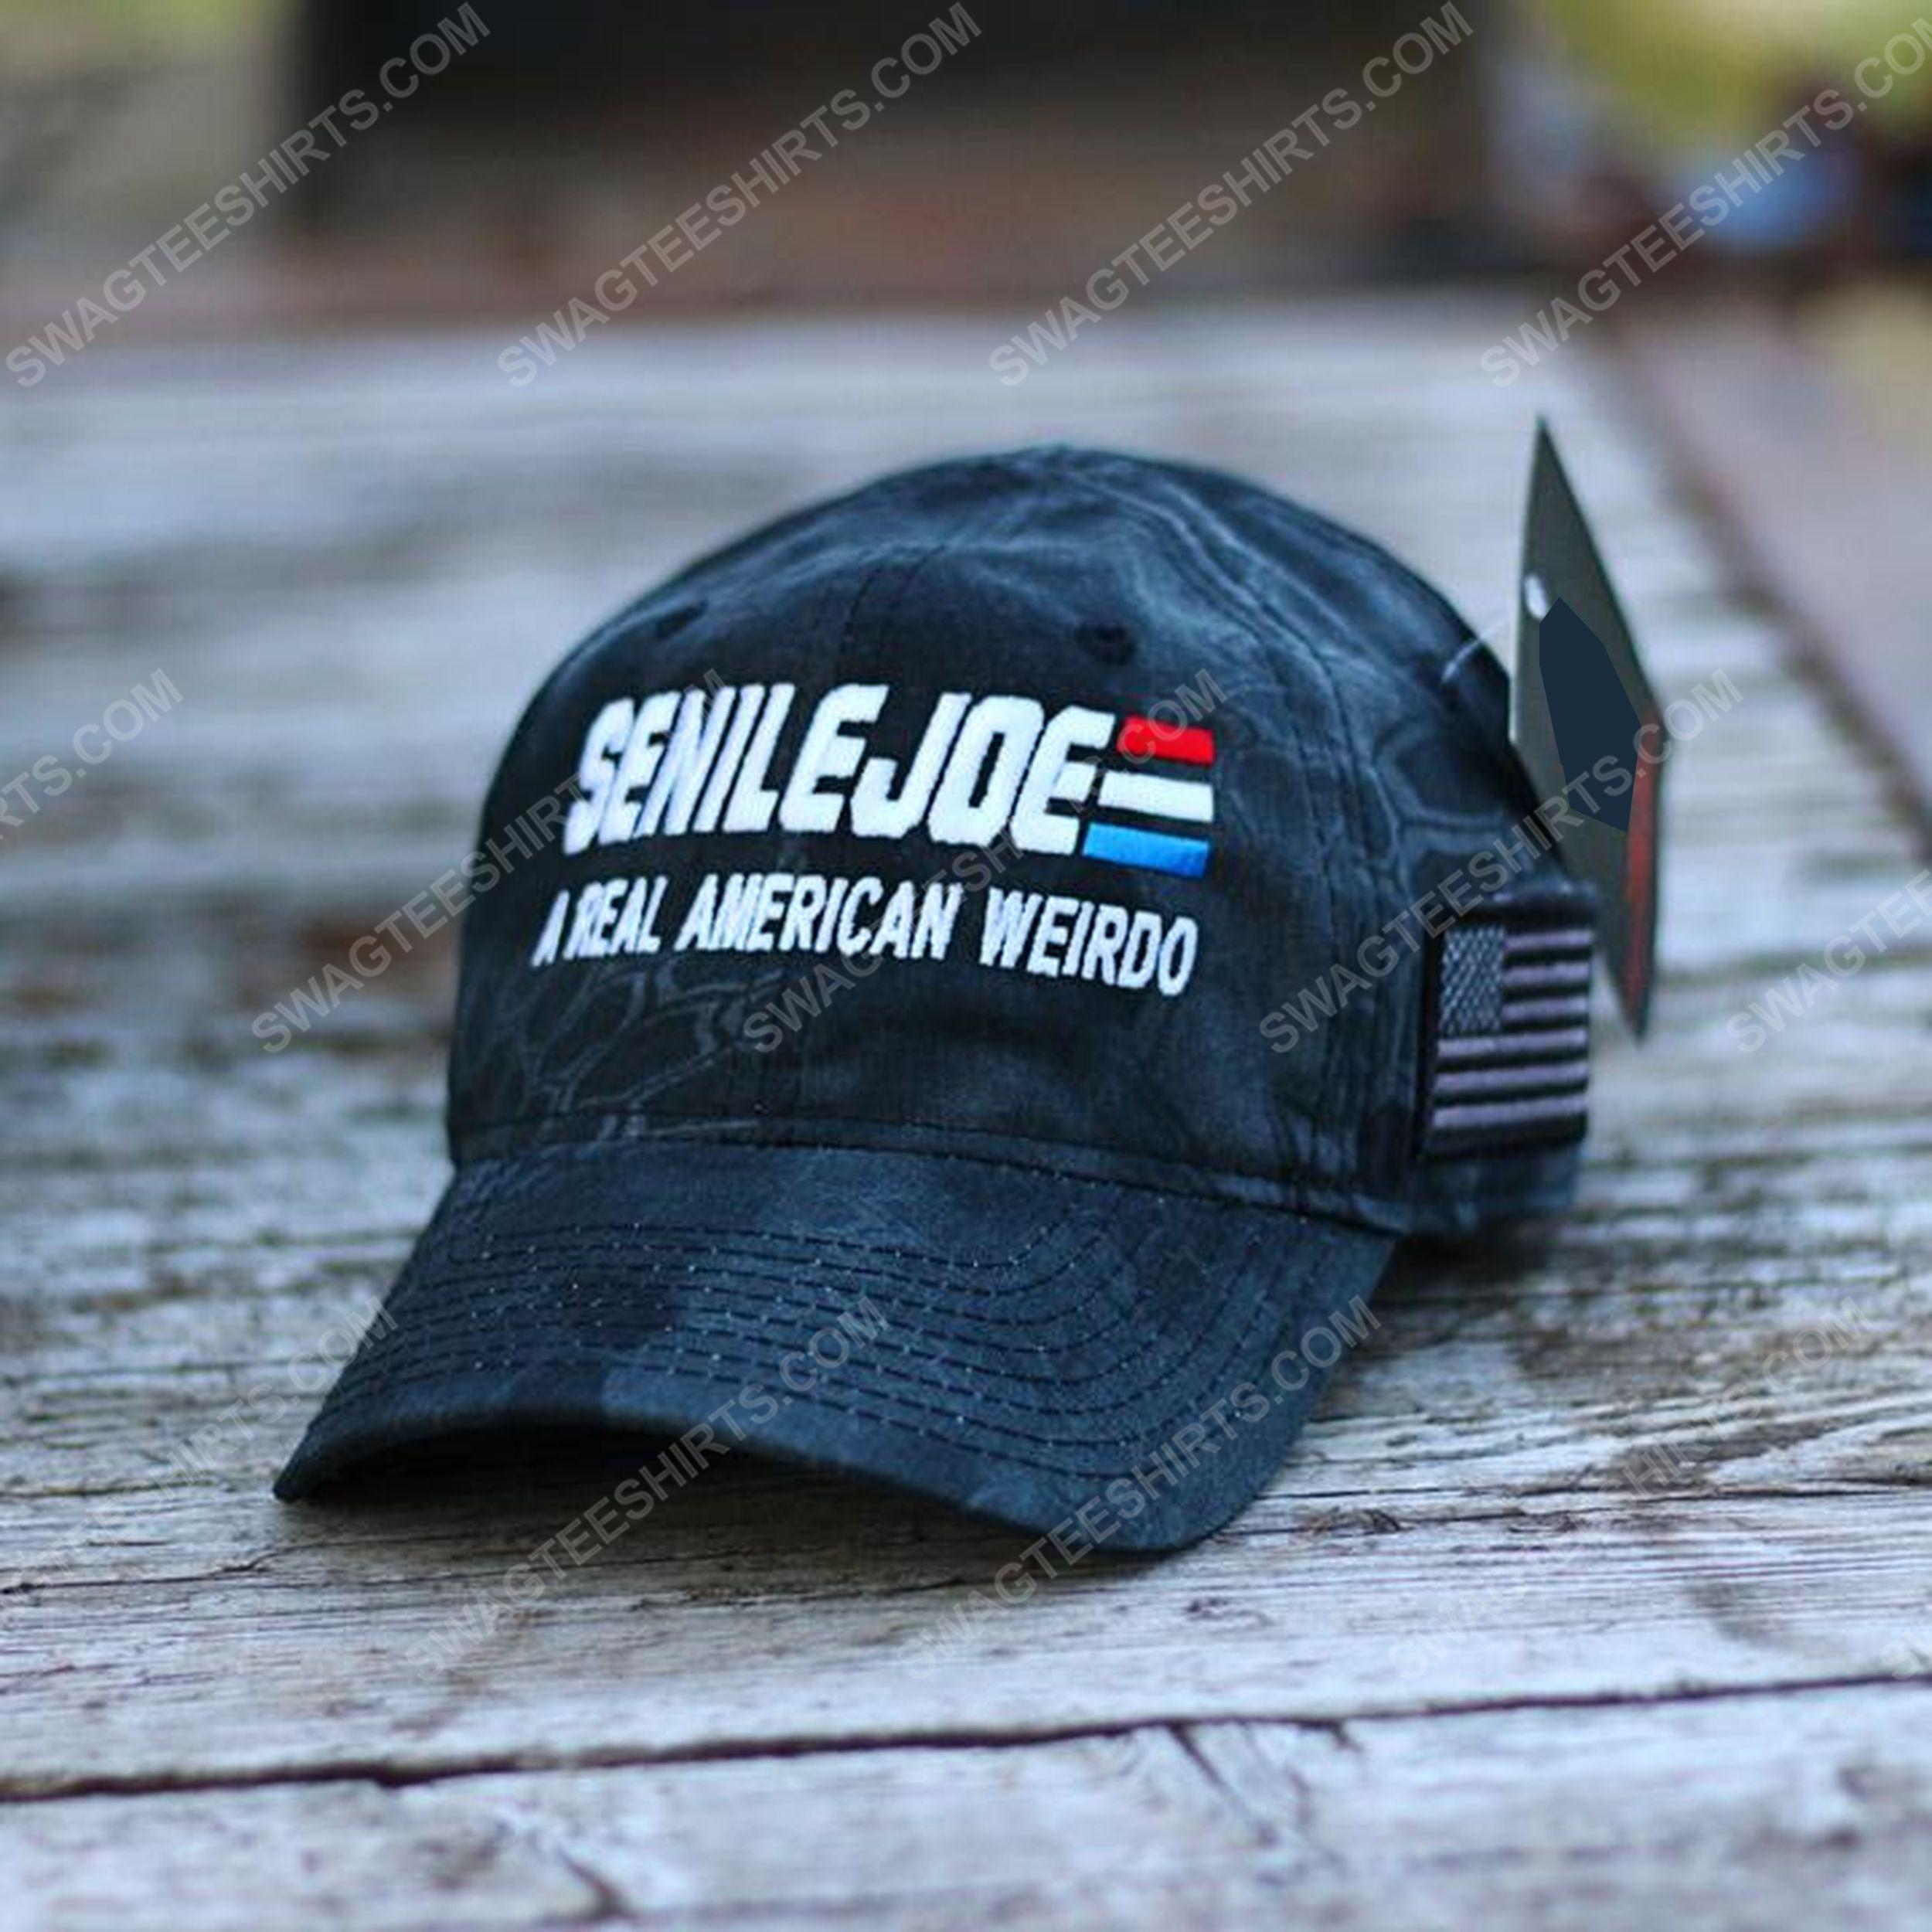 Senile joe a real american weirdo full print classic hat 1 - Copy (2)